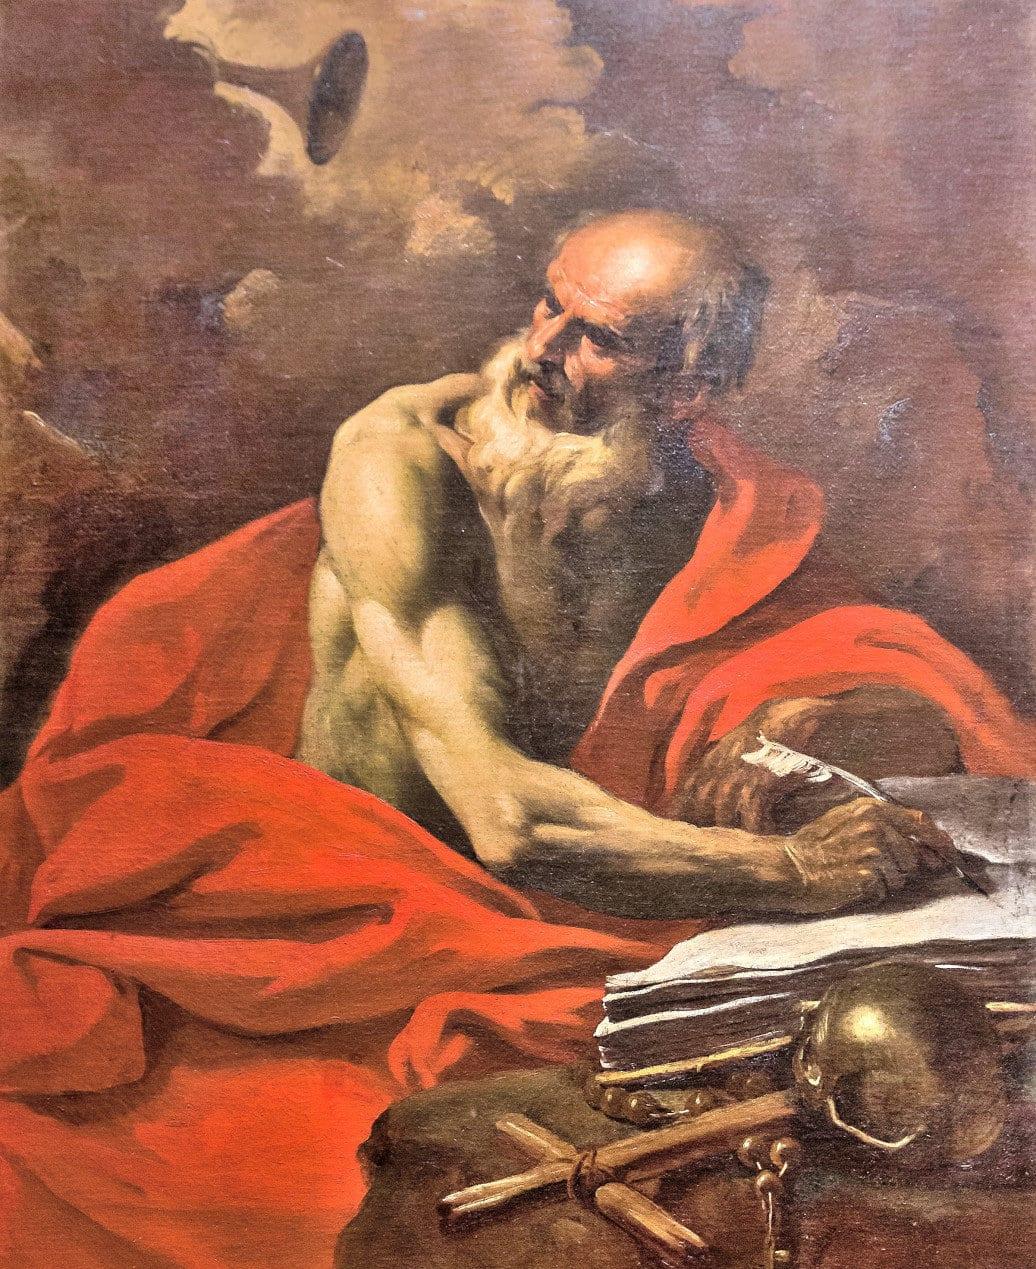 Vatican Art Gallery - Pier Francesco Mola - The penitent St. Jerome